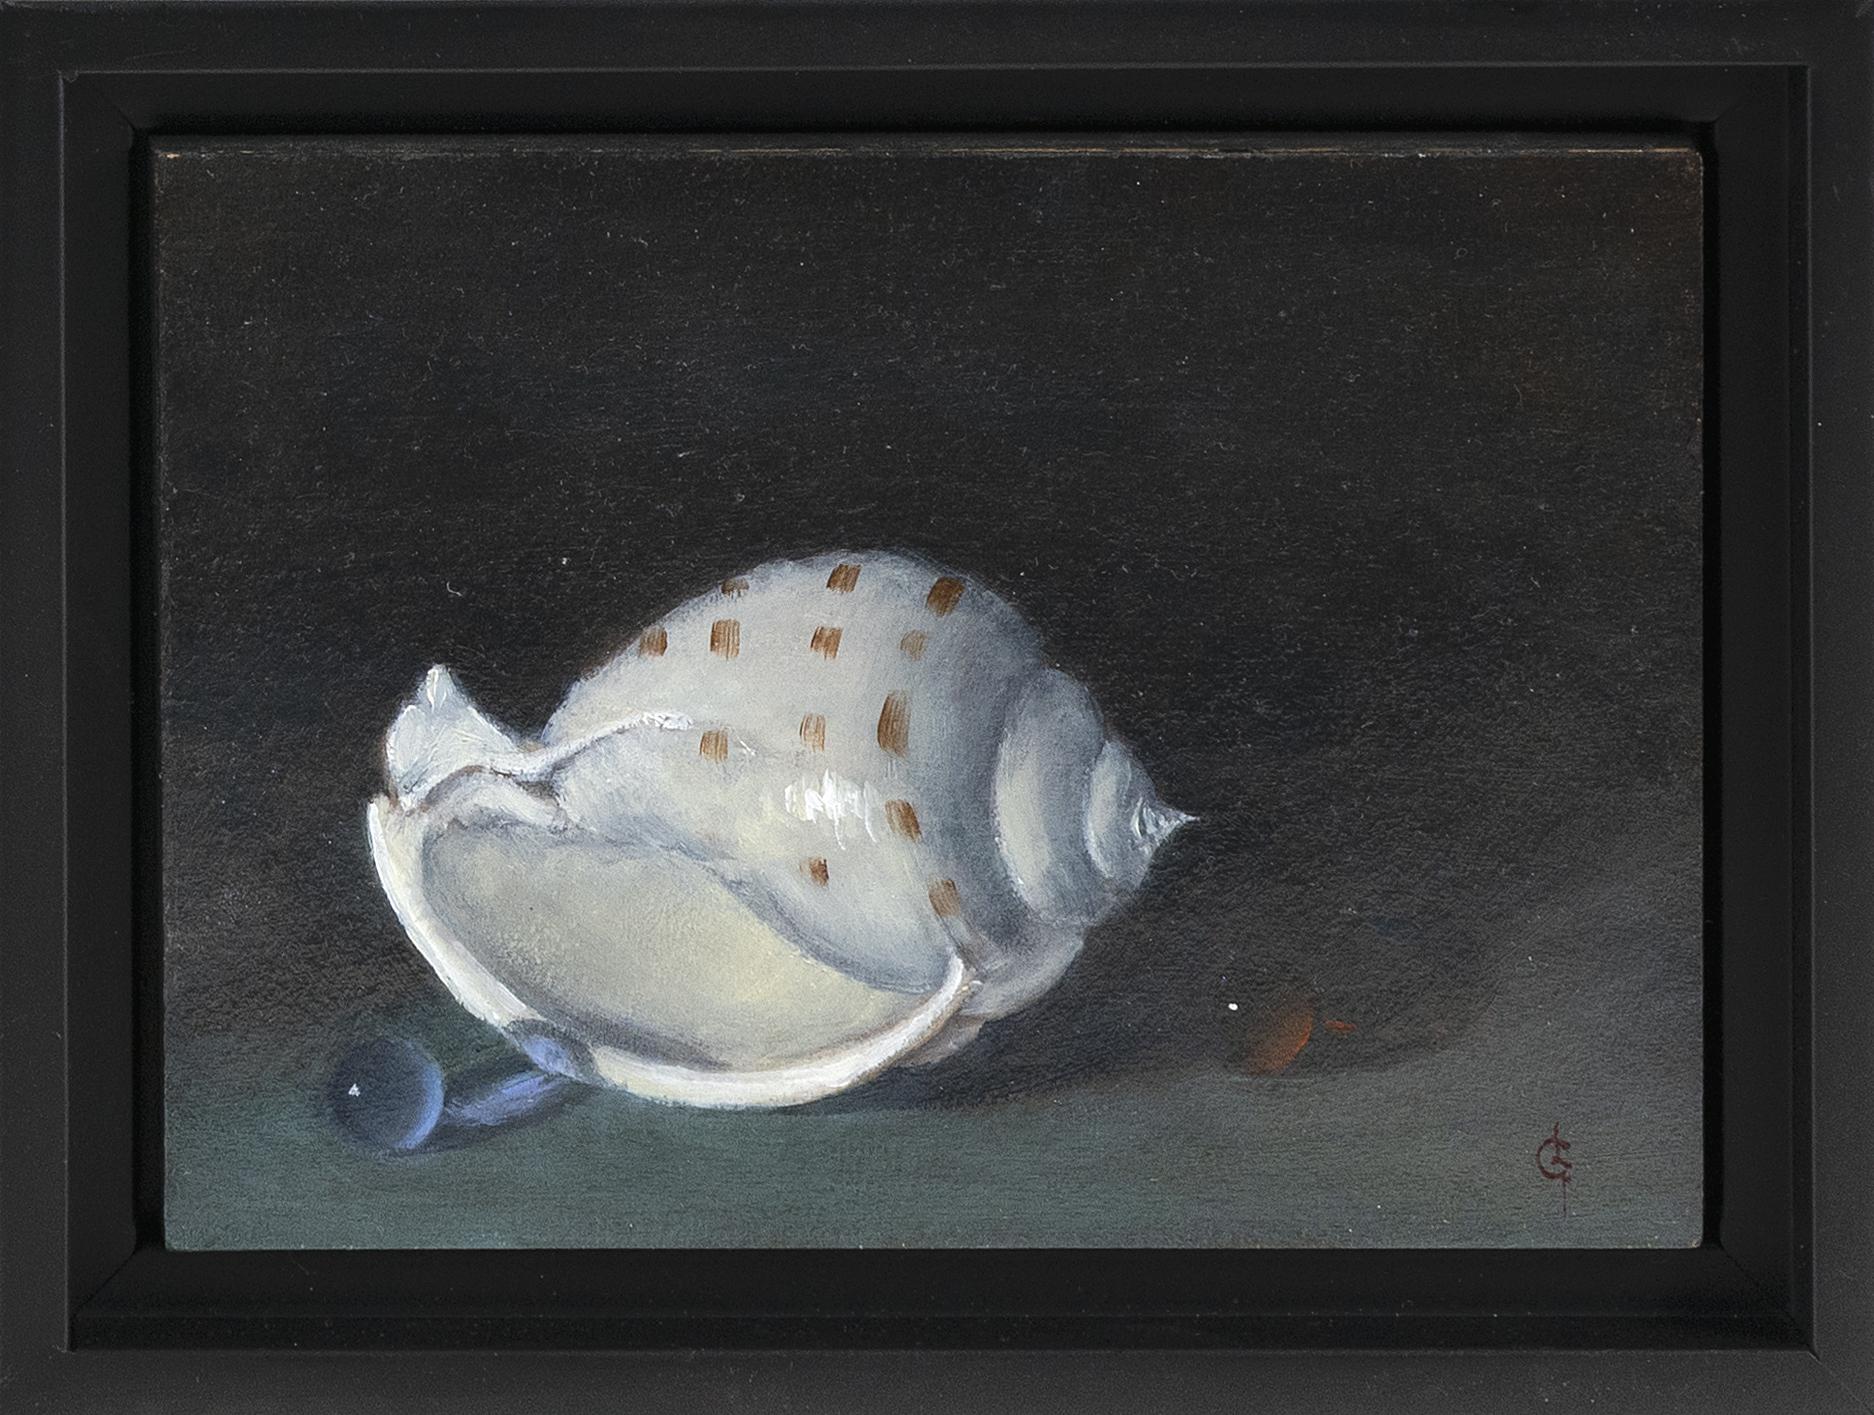 "LESLIE GABOSH (America, Contemporary), Seashell., Oil on board, 5"" x 7"". Framed 6.5"" x 8.5""."